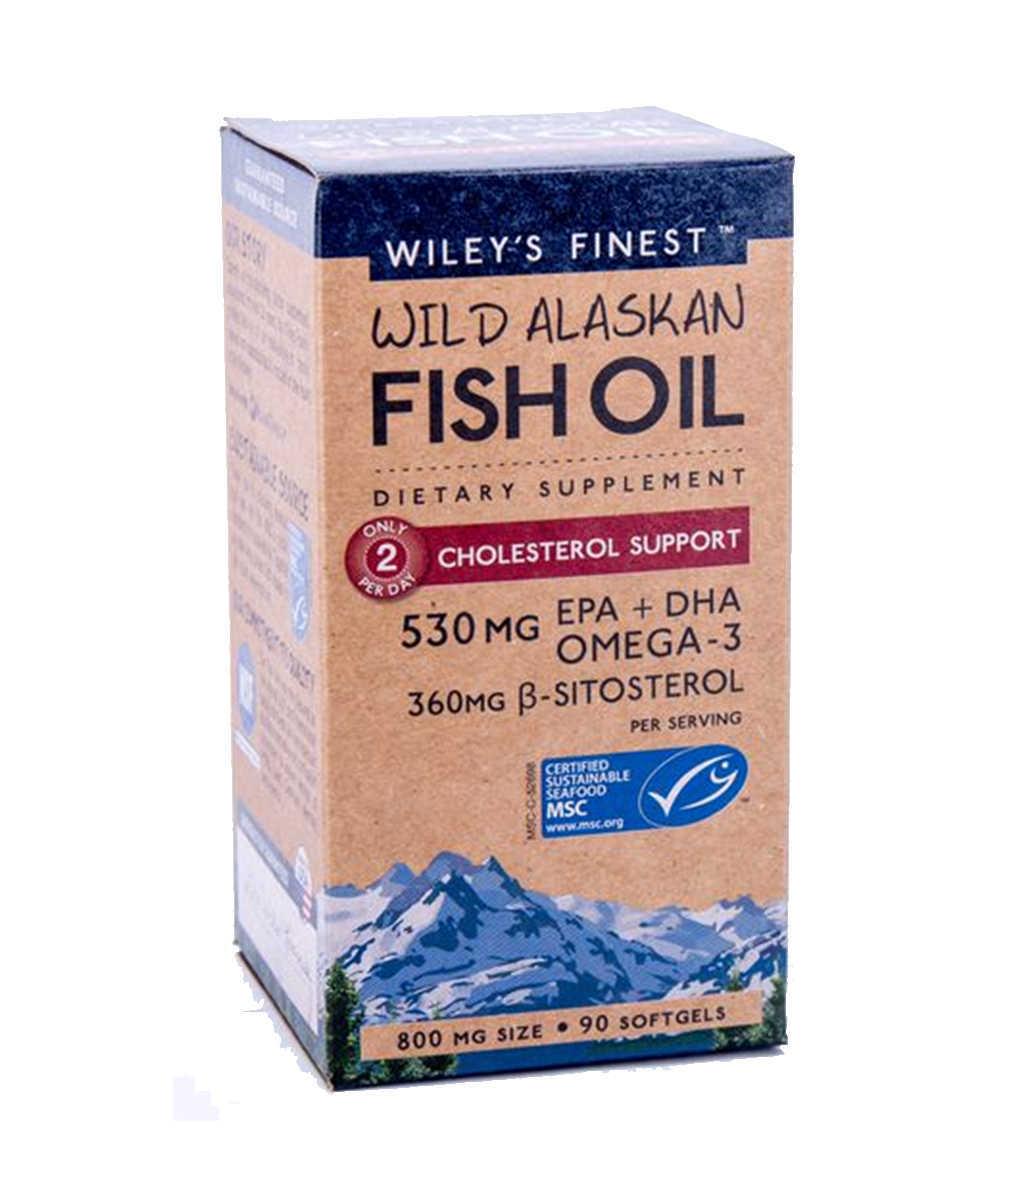 wiley's finest cholesterol support wild alaskan fish oil